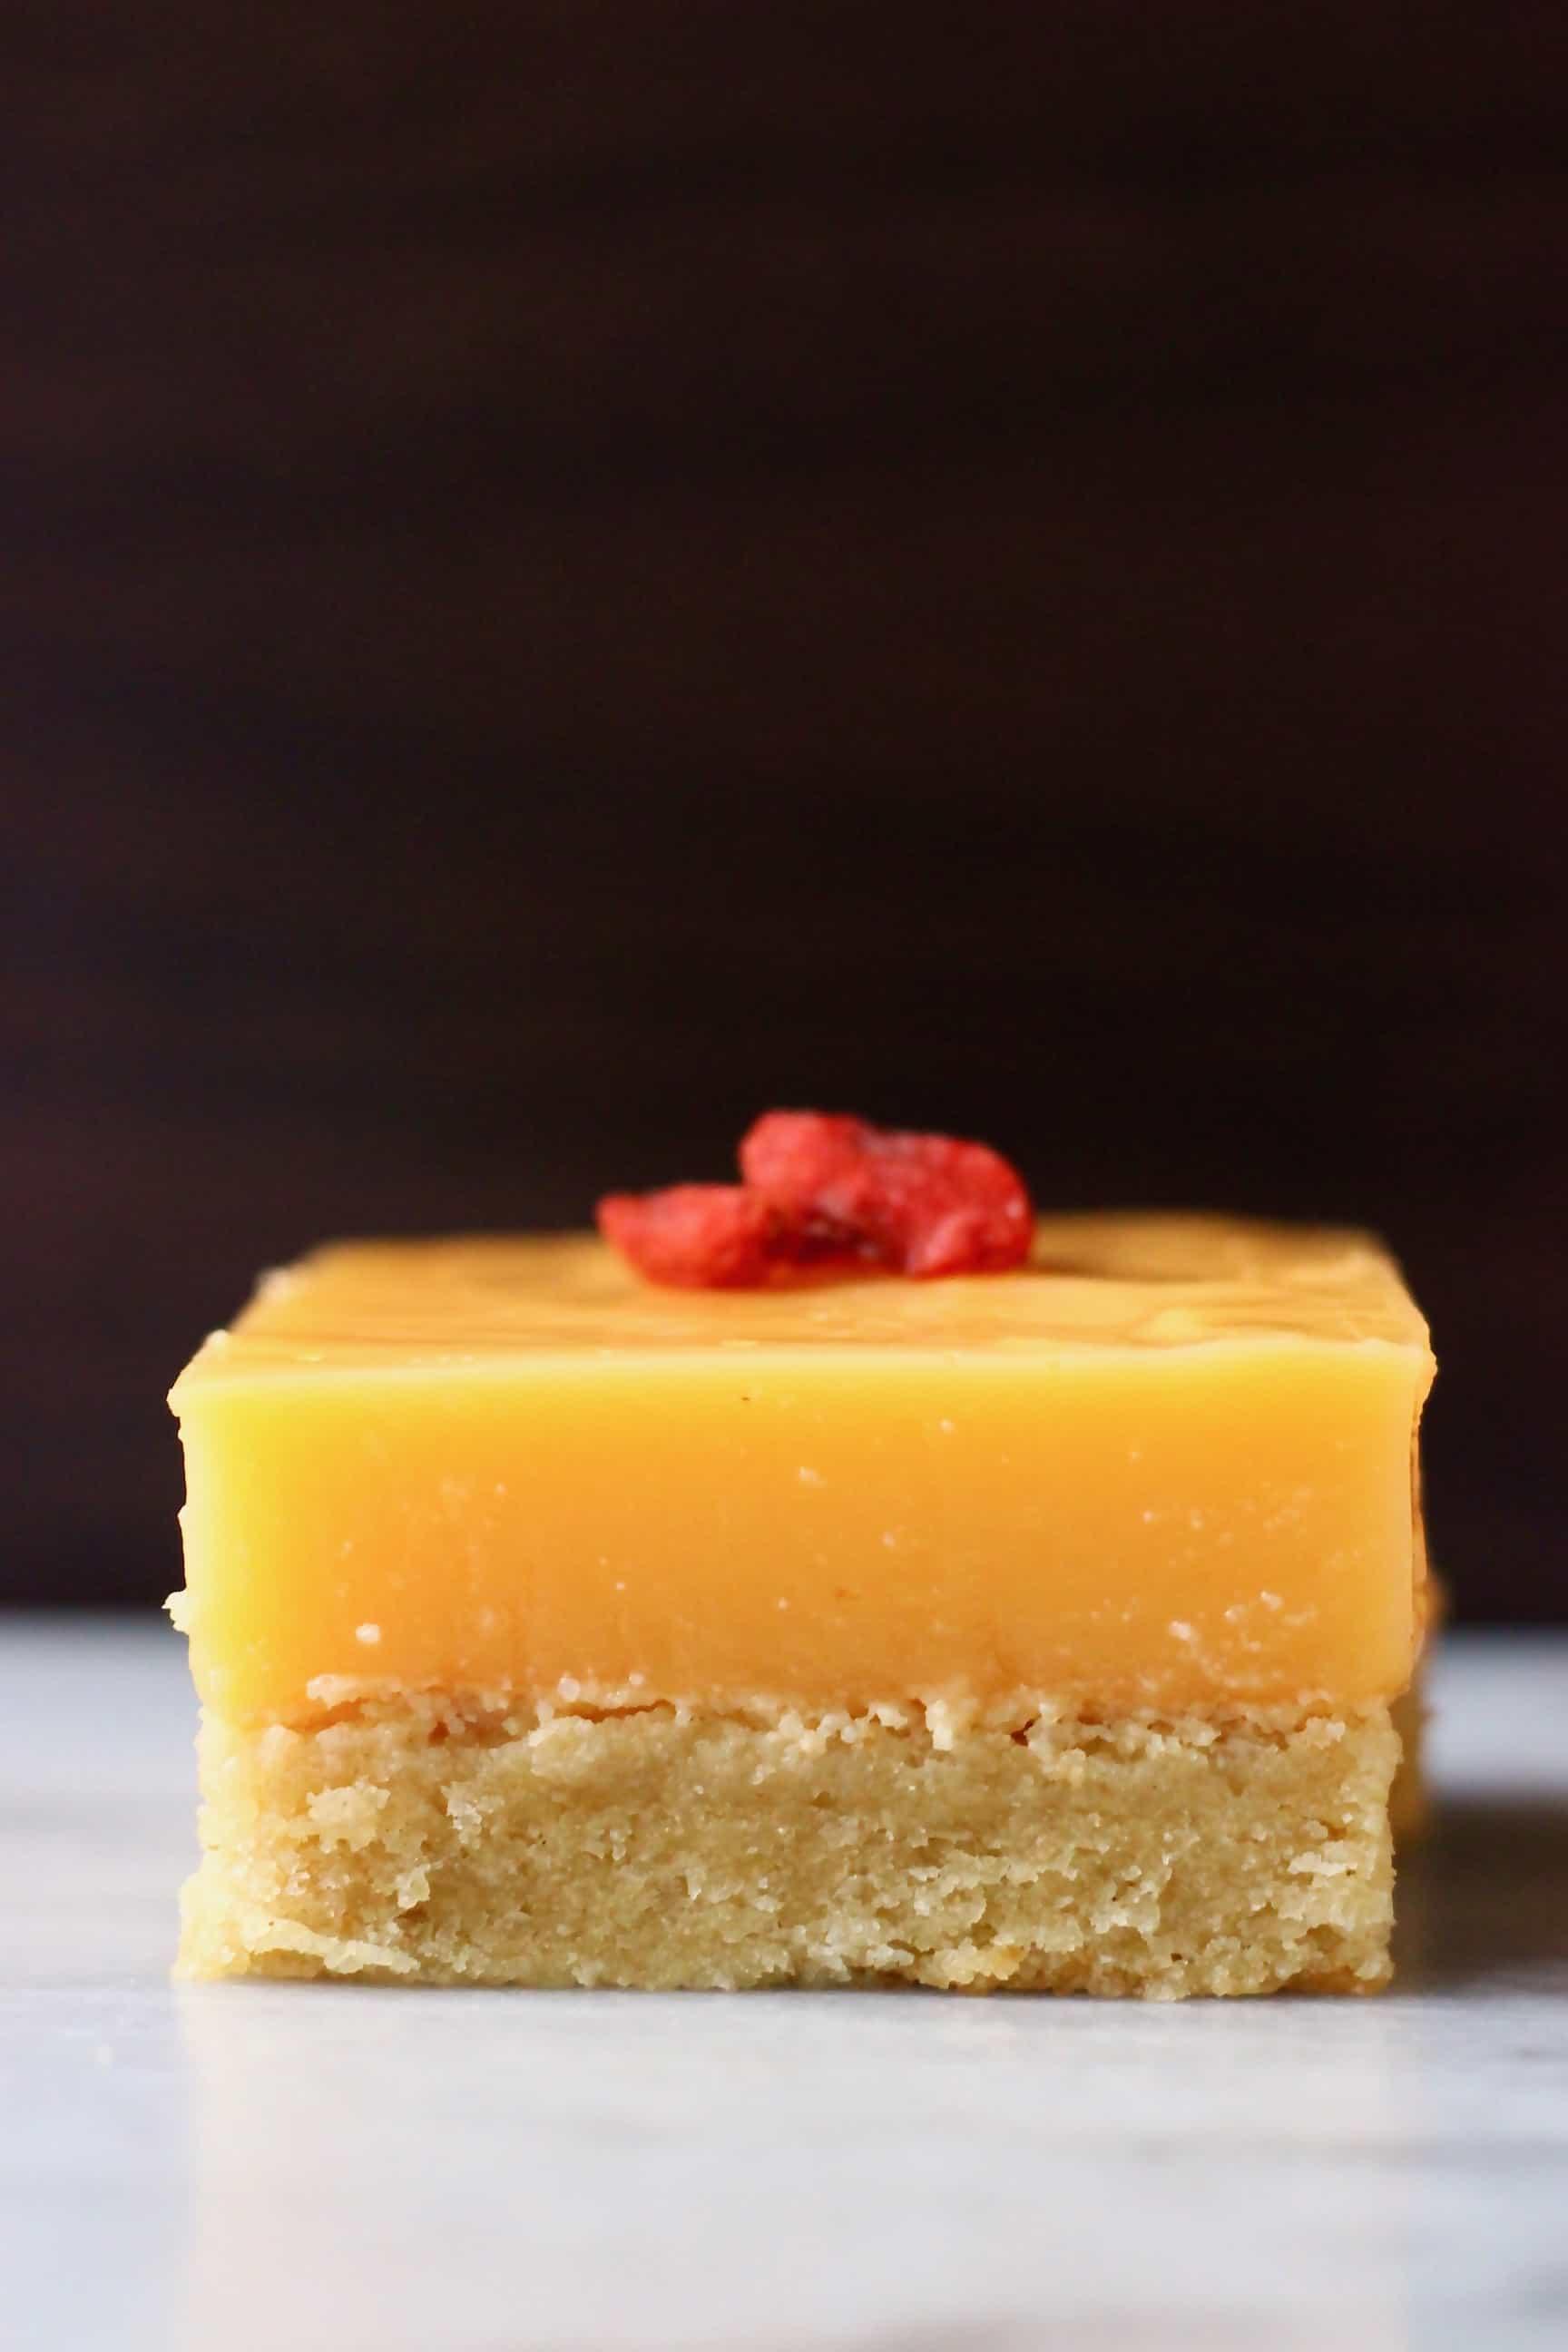 A gluten-free vegan lemon bar topped with goji berries